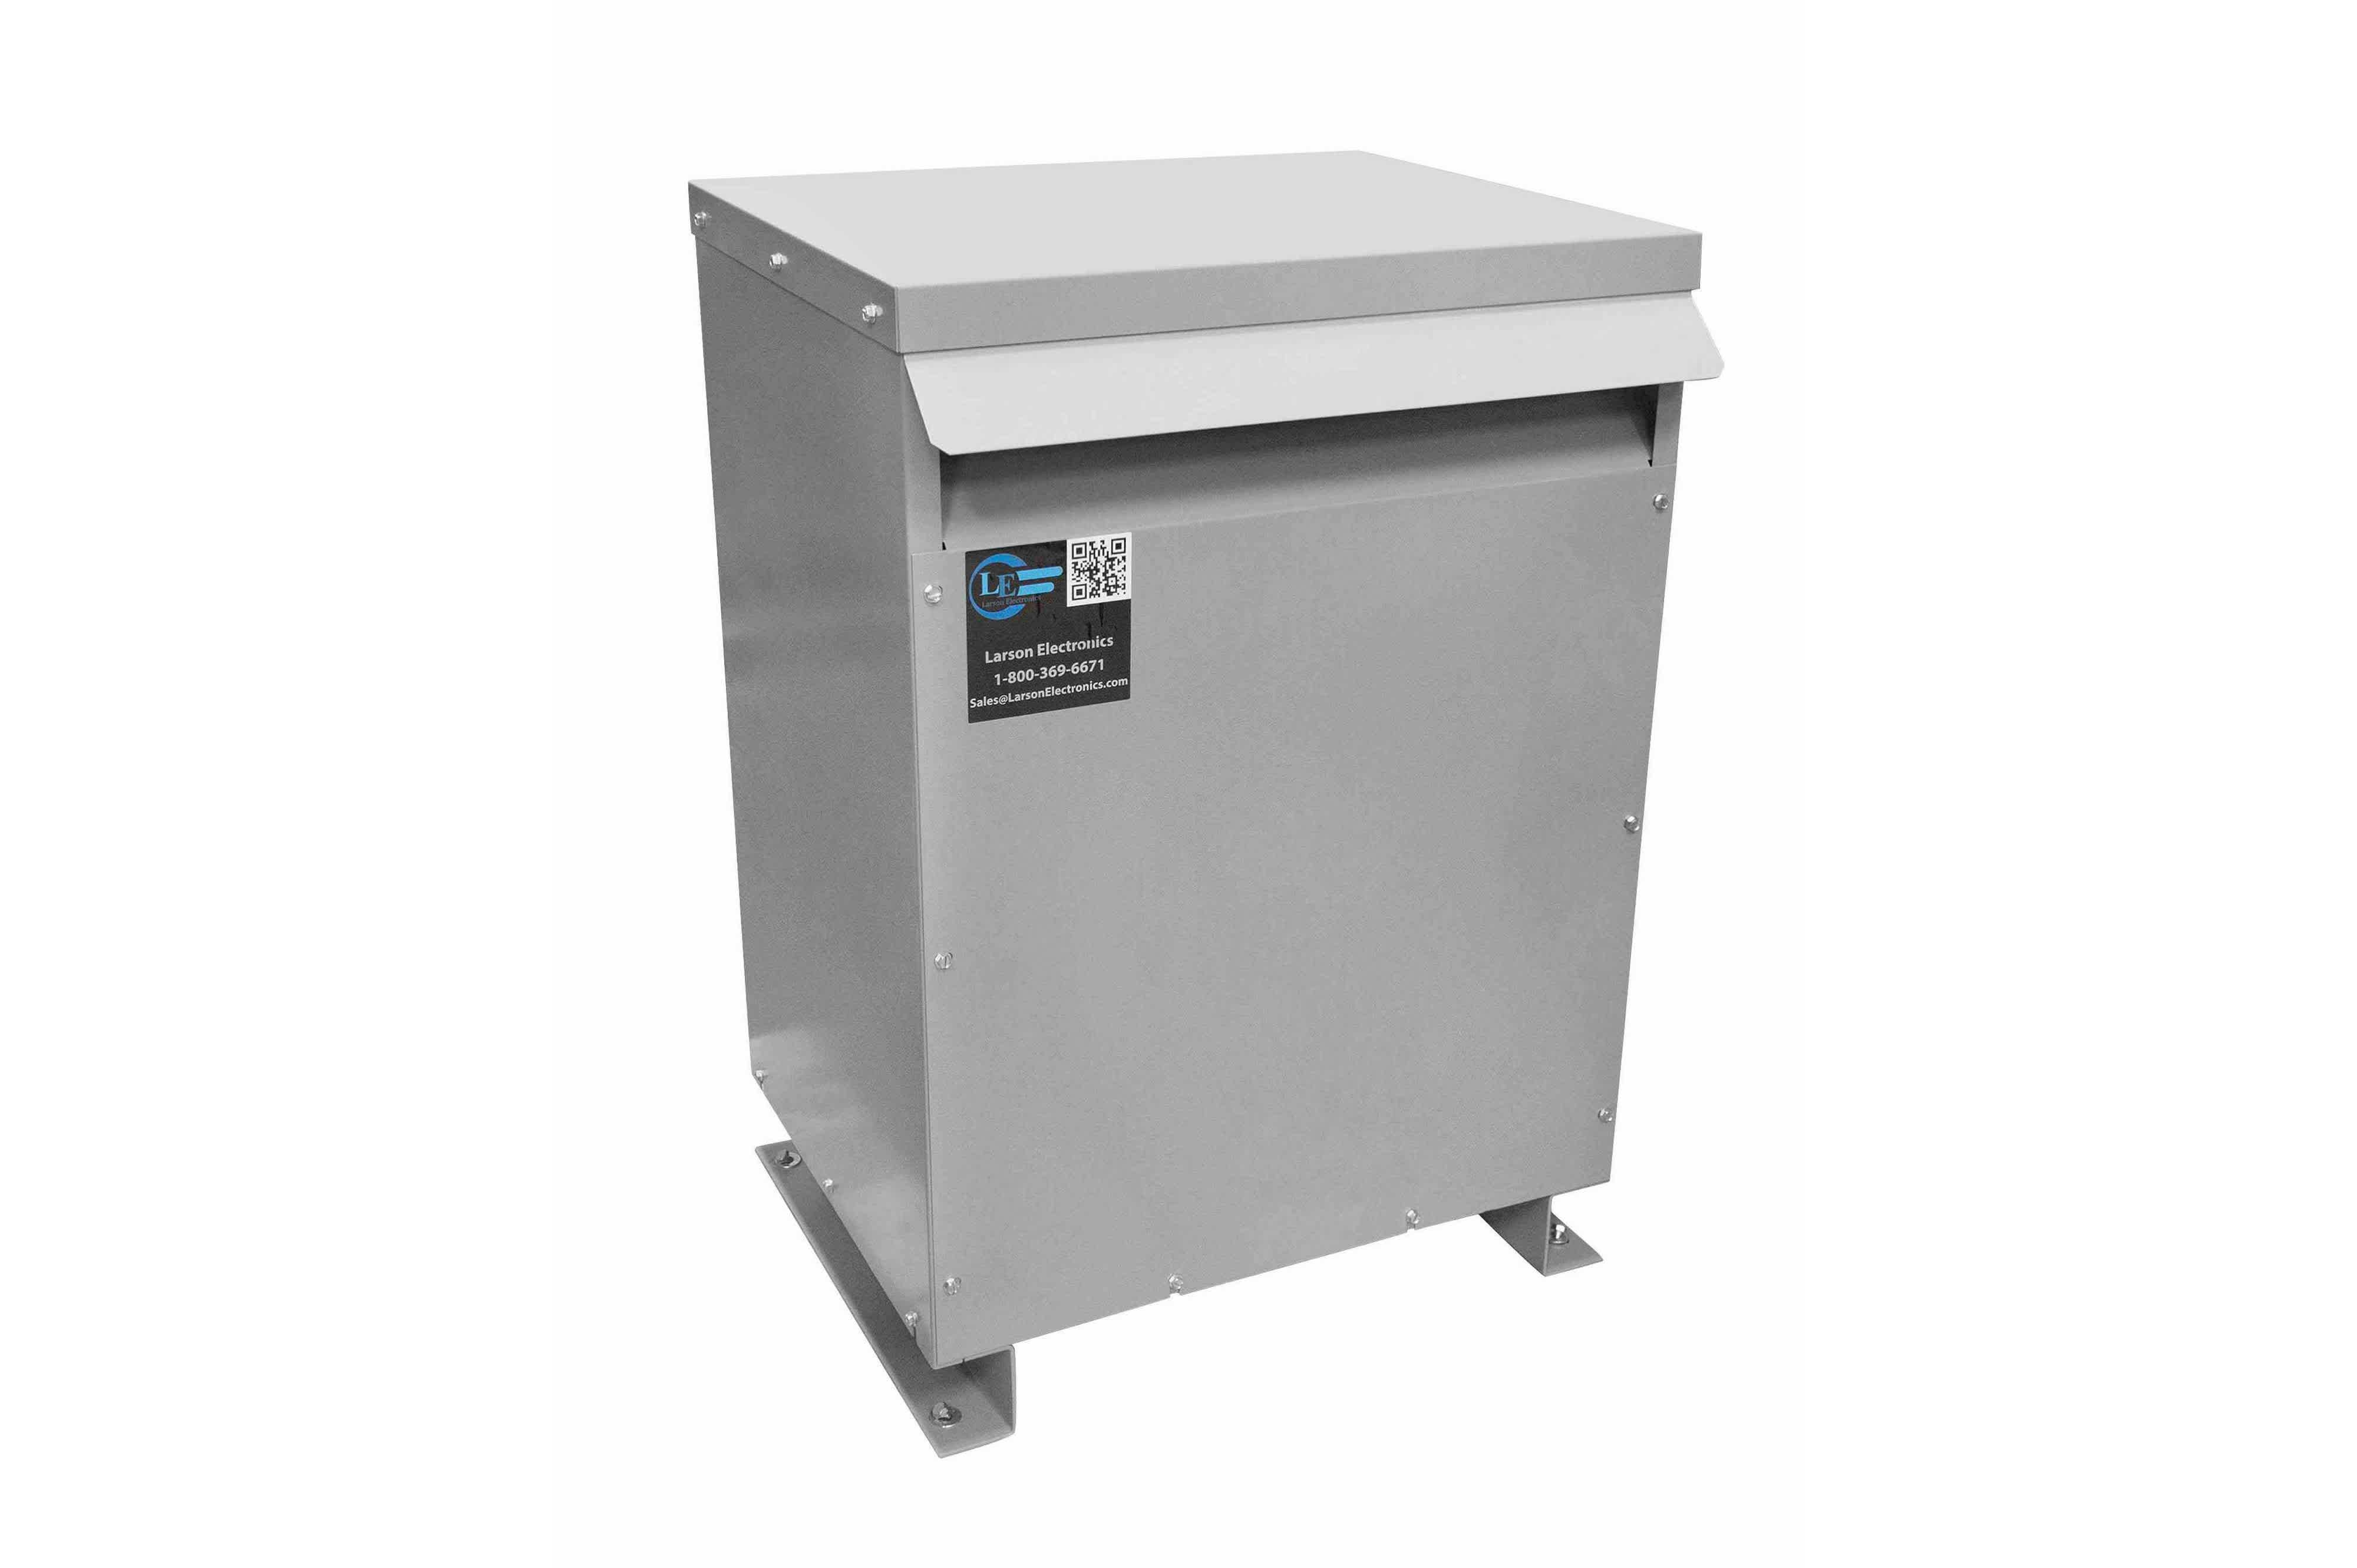 15 kVA 3PH Isolation Transformer, 208V Wye Primary, 240V/120 Delta Secondary, N3R, Ventilated, 60 Hz